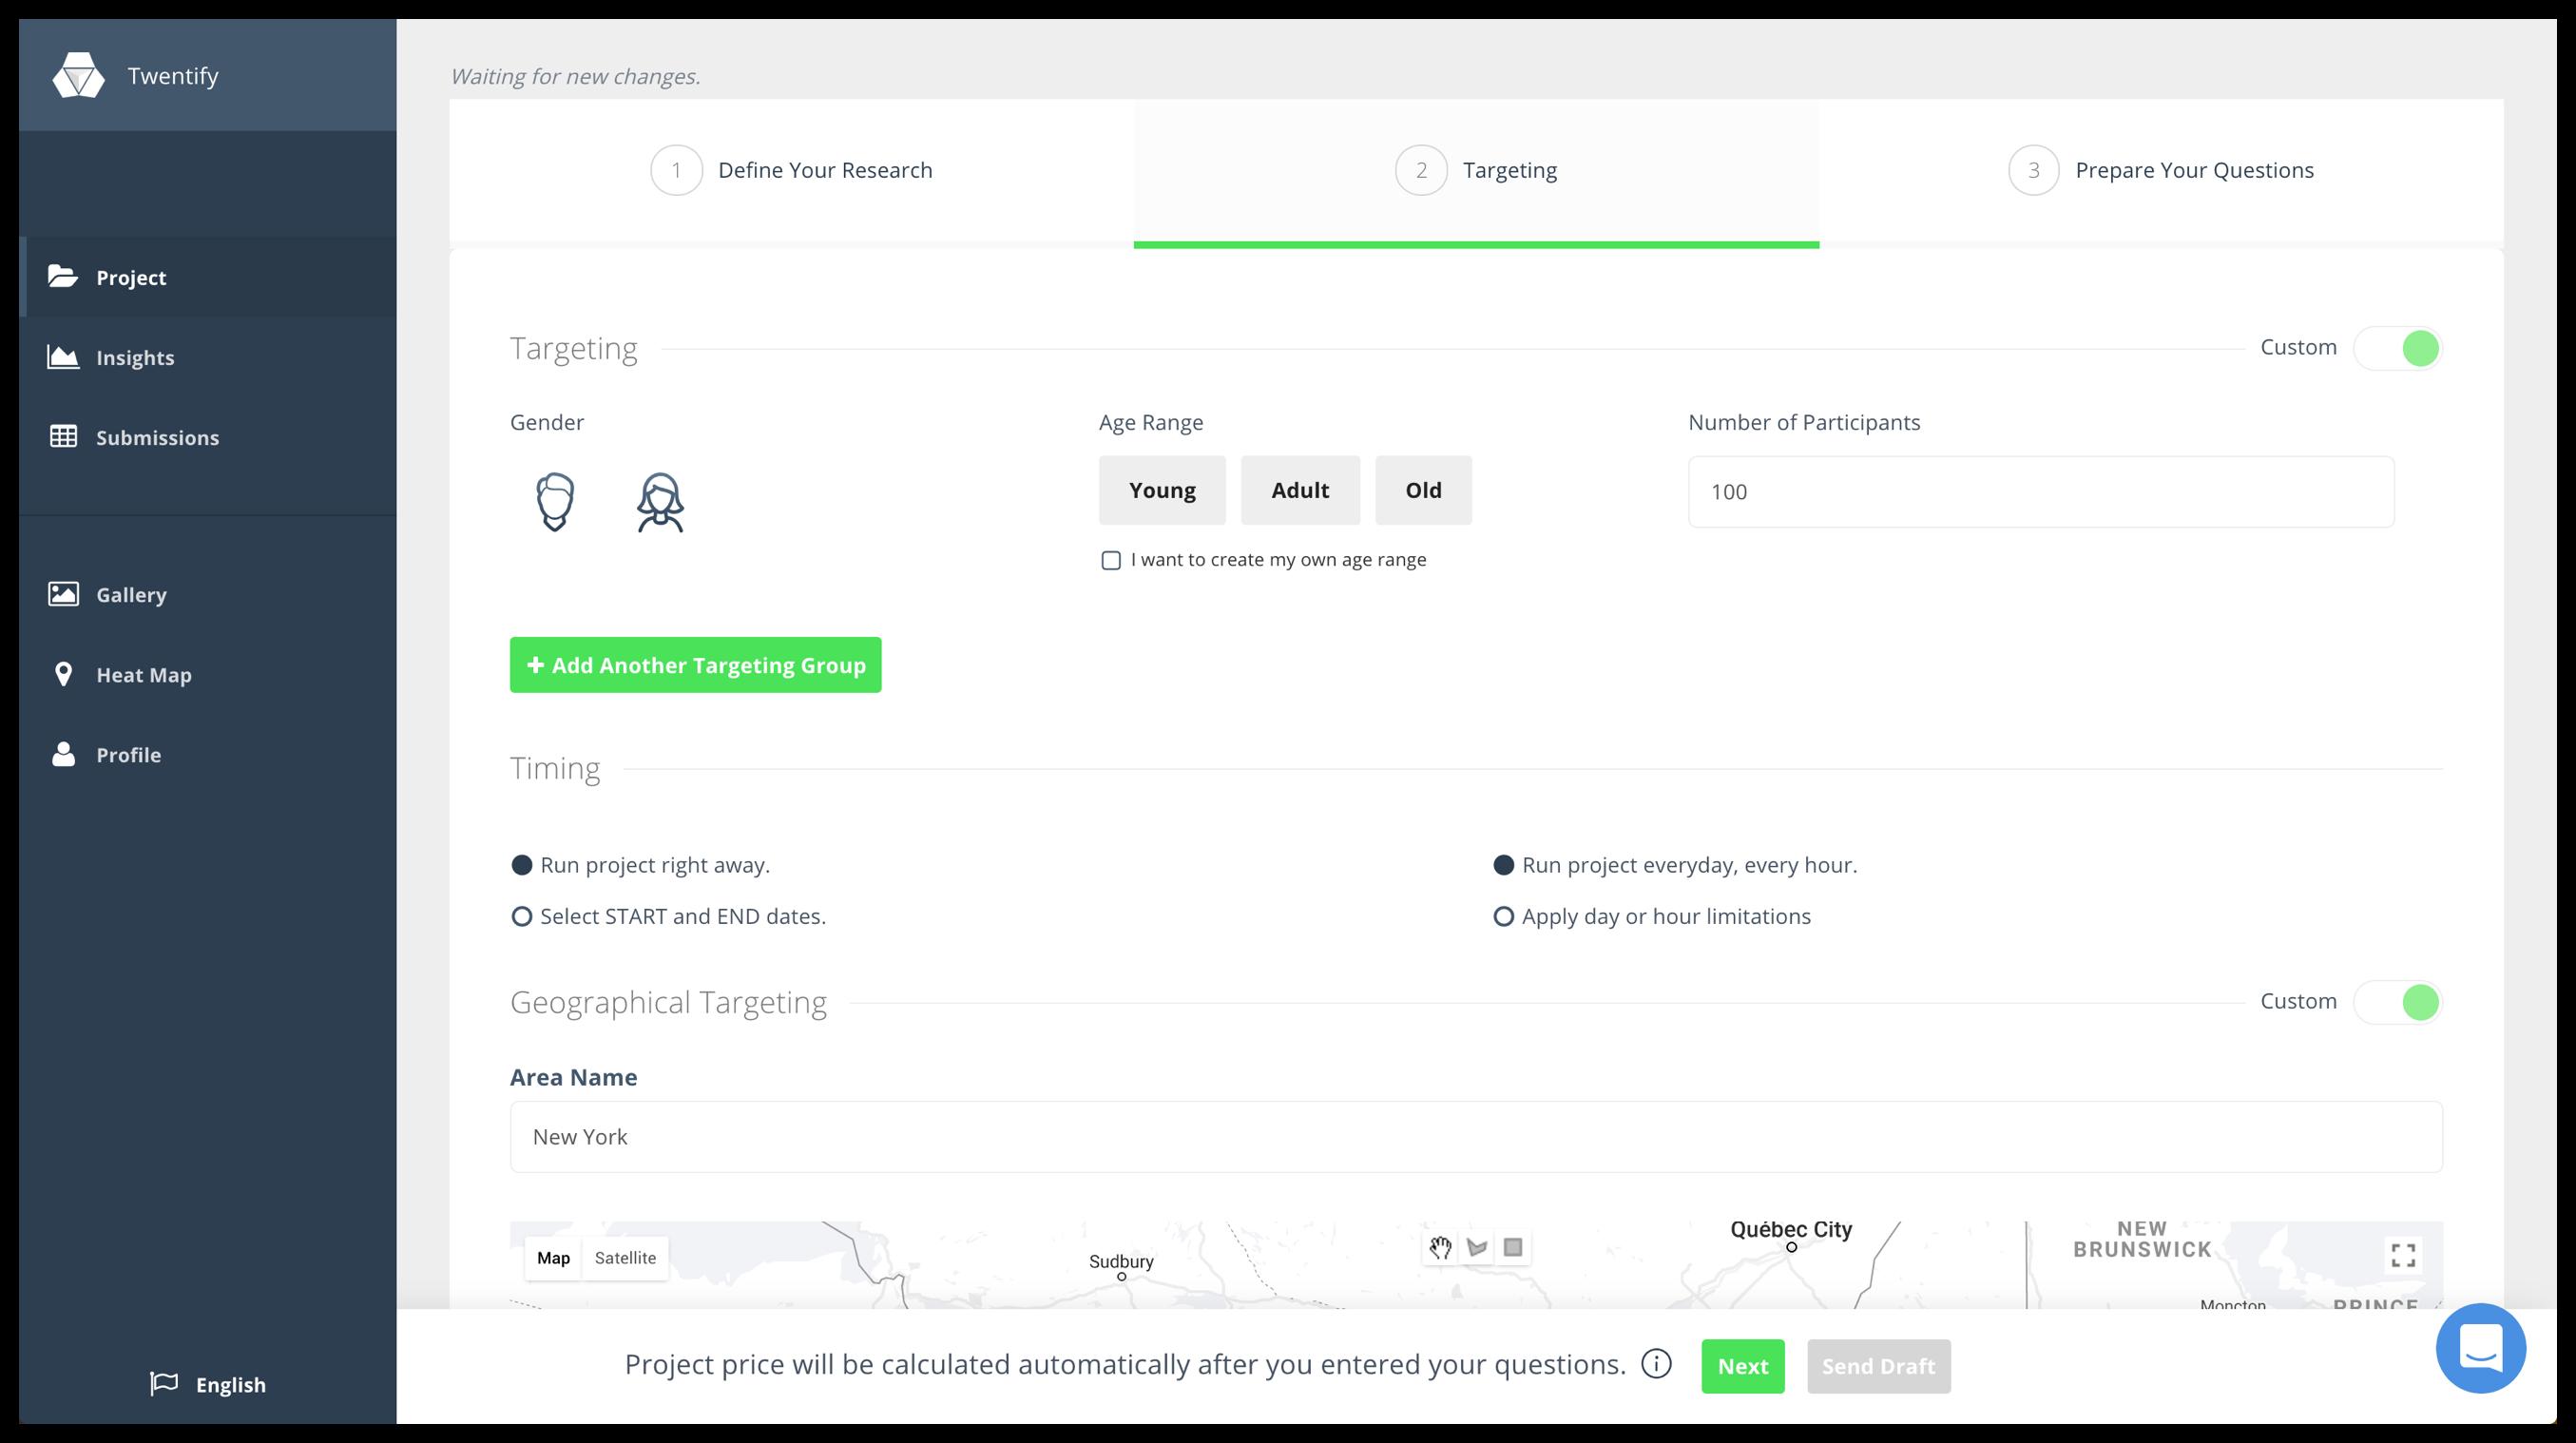 methodology_customer-dashboard_self-service.png